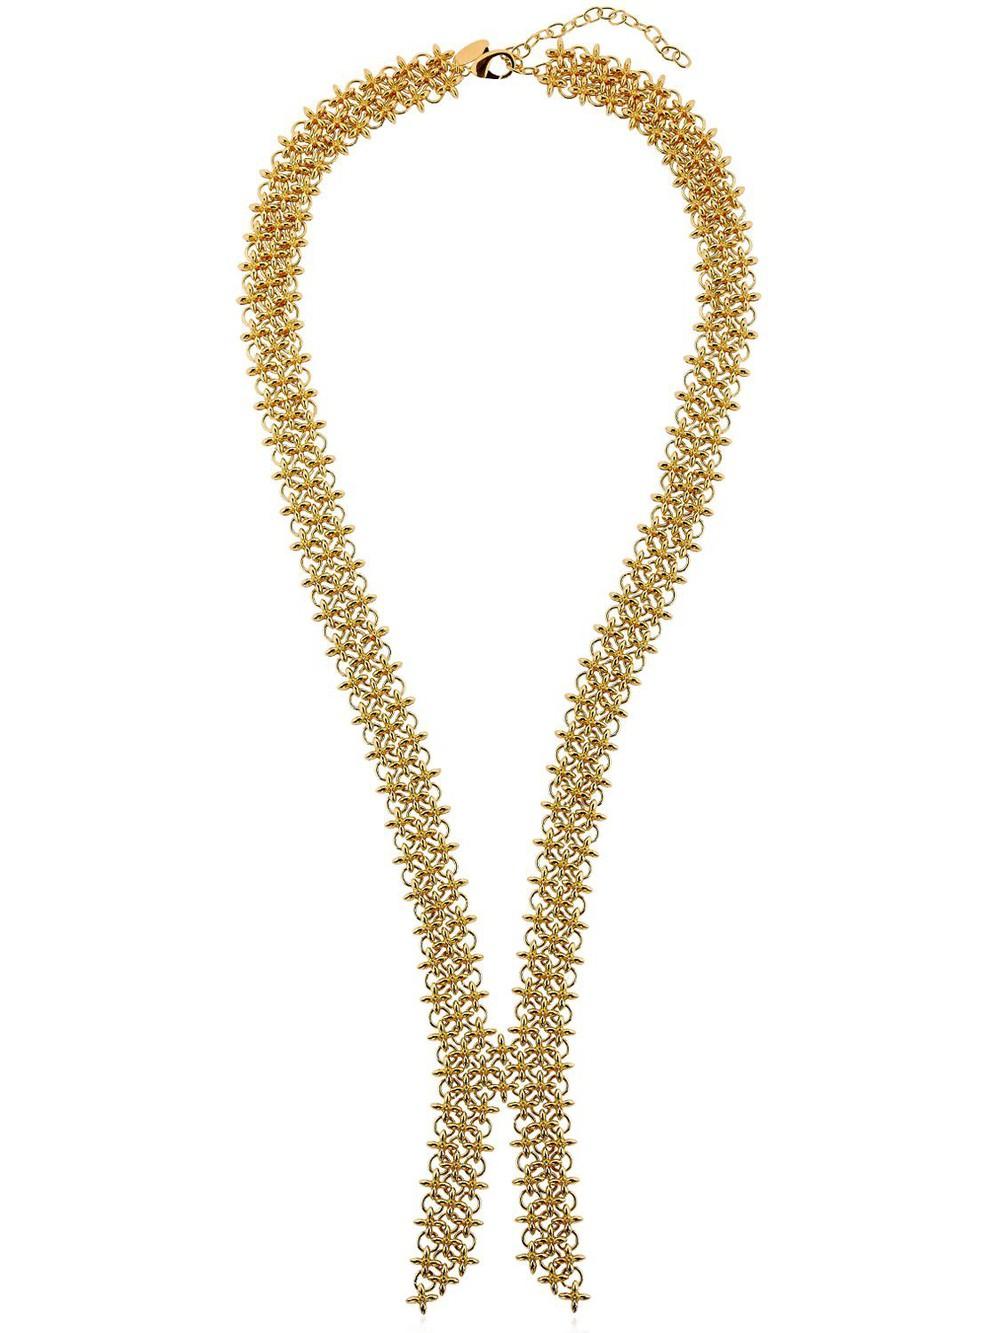 giuseppe zanotti design crystal choker necklace in black wheretoget. Black Bedroom Furniture Sets. Home Design Ideas